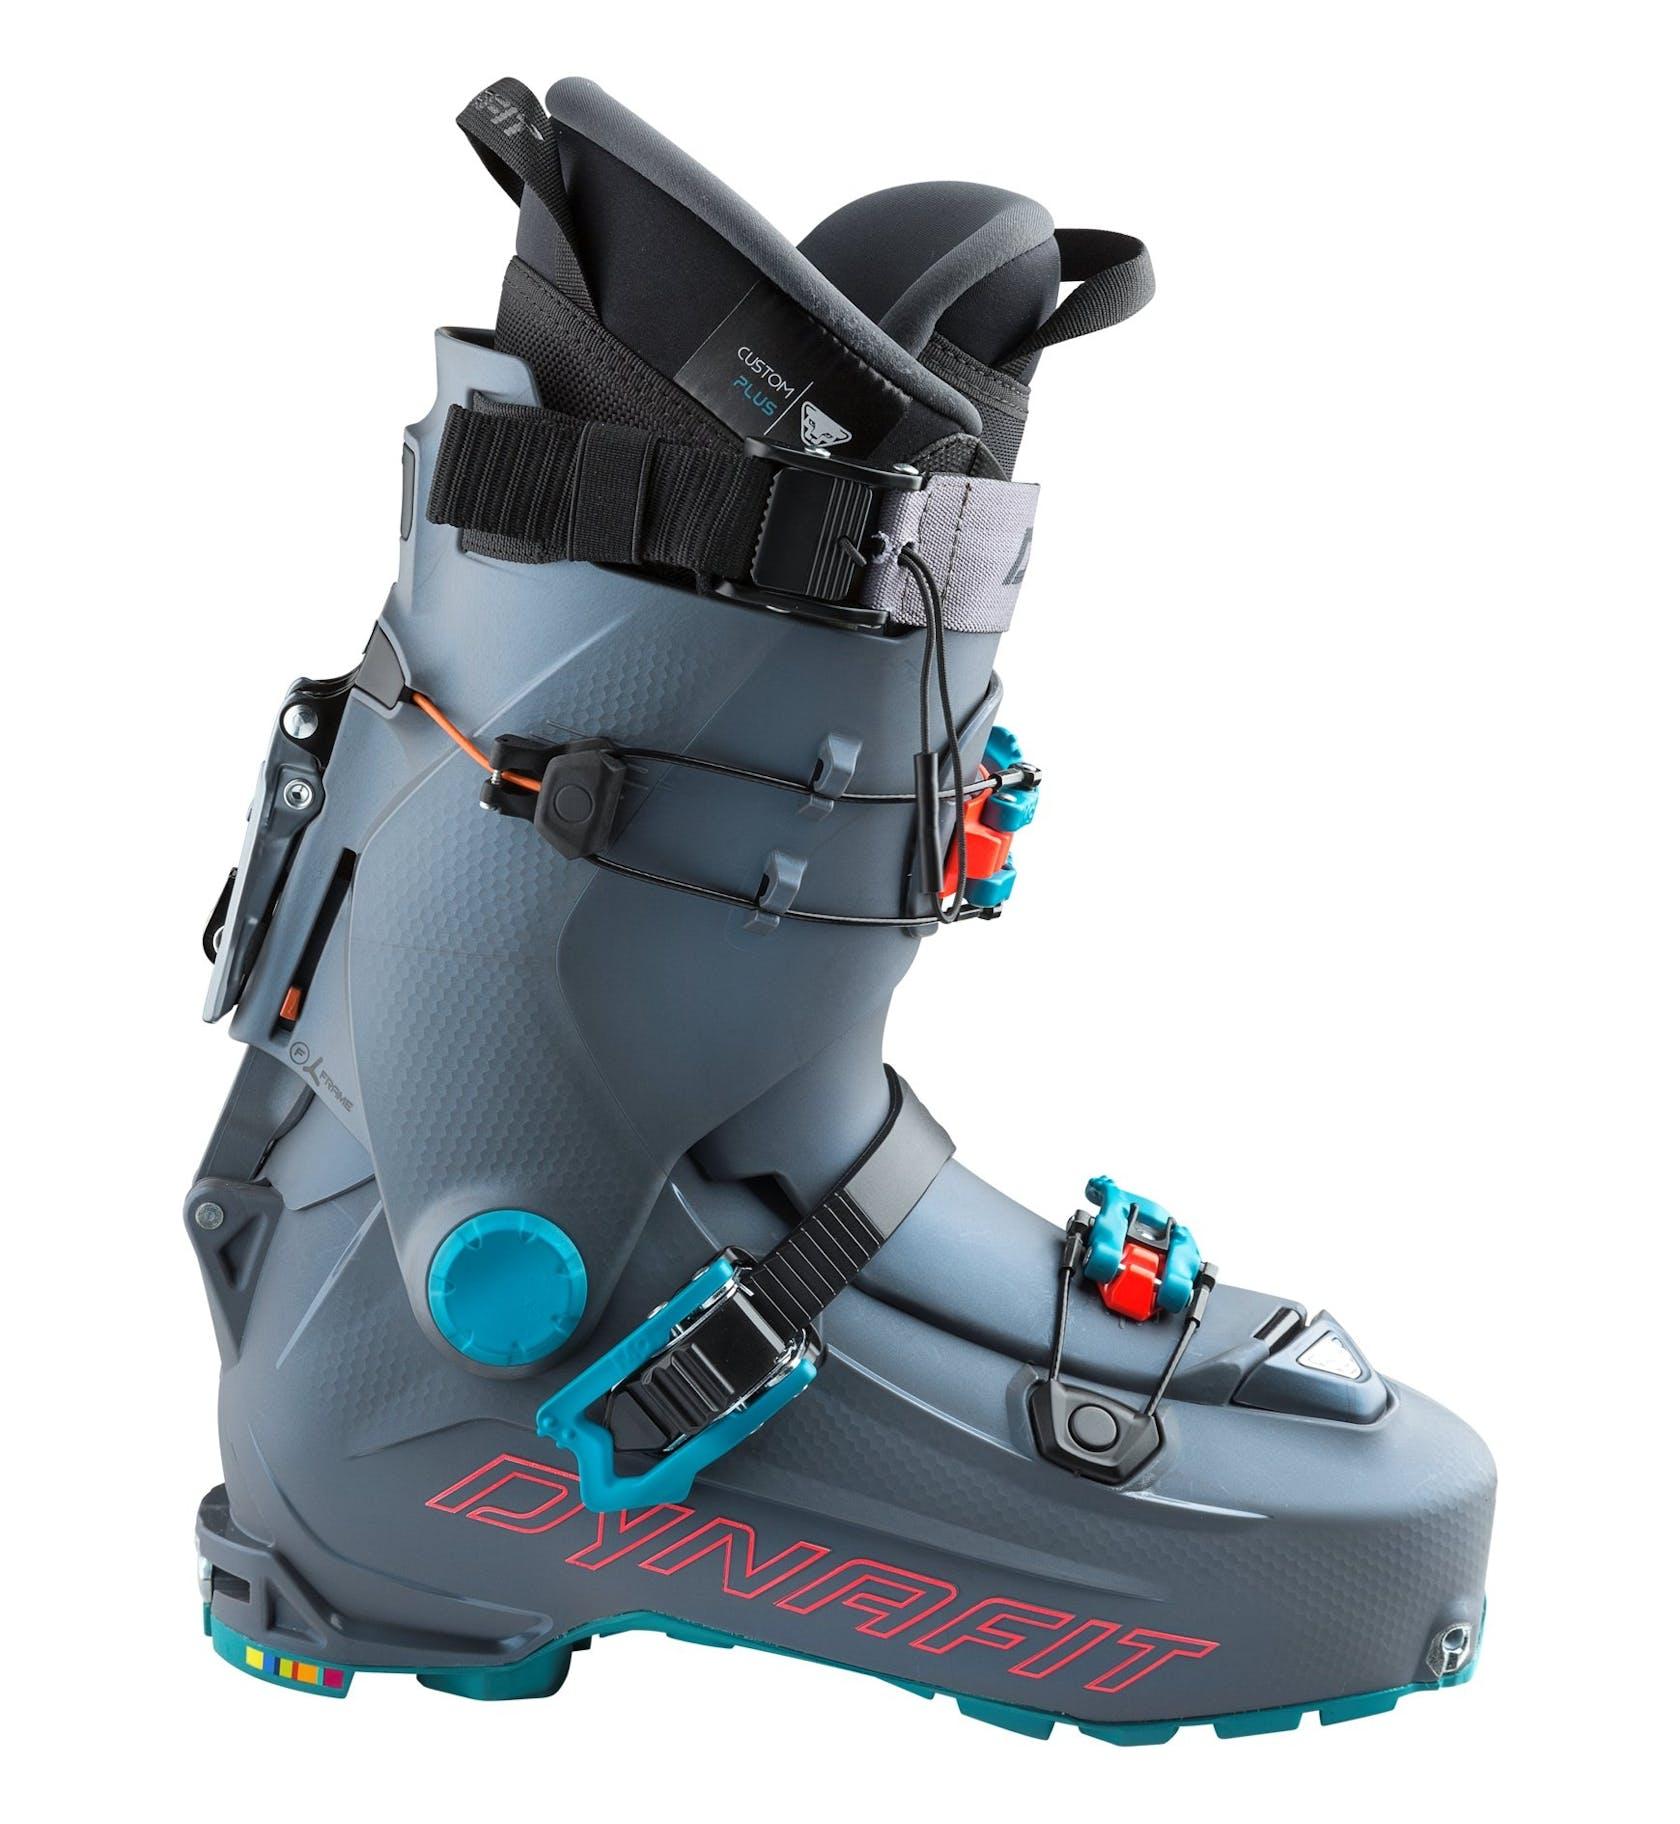 Dynafit Hoji Pro Tour W - Skitourenschuh - Damen